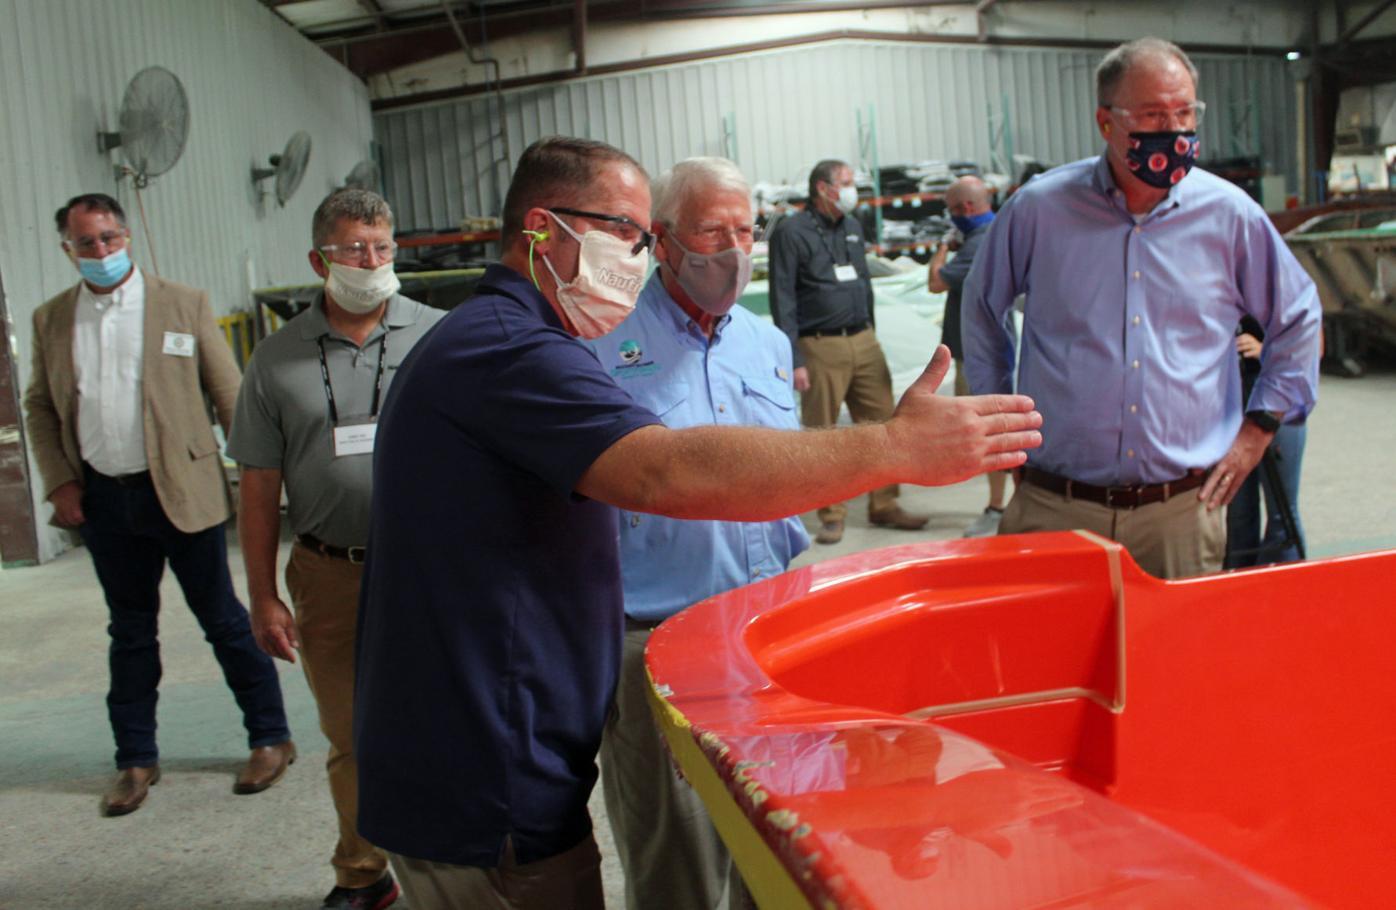 mcj-2020-08-26-news-nauticstar-congressional-visit-main